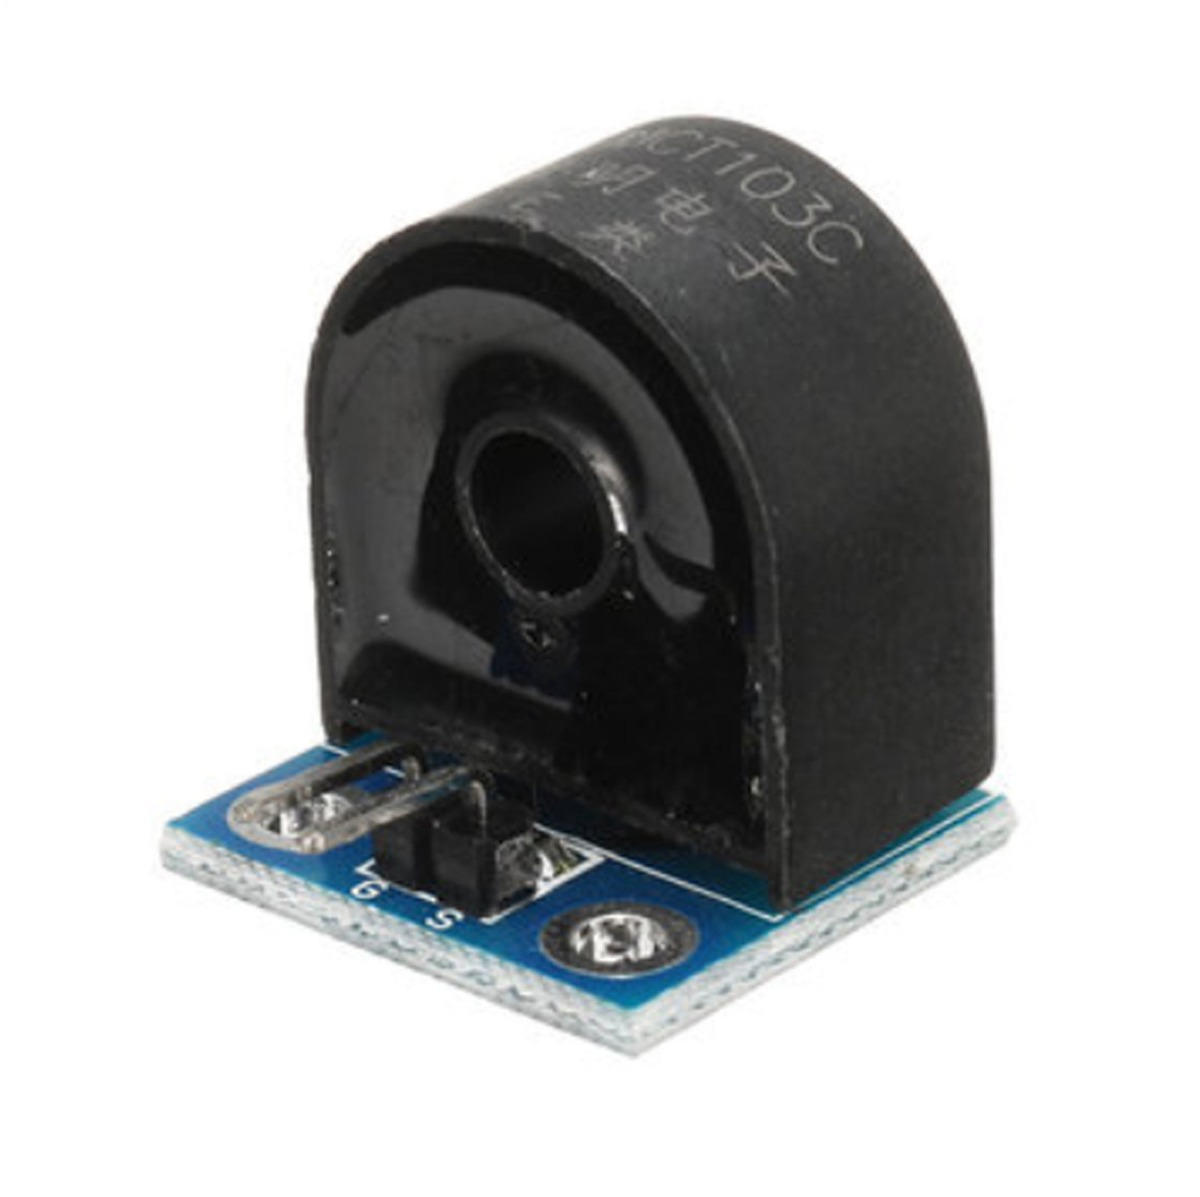 modulo-sensor-transformador-de-corriente-ac-5a-no-invasivo-D_NQ_NP_776374-MLA27716764767_072018-F